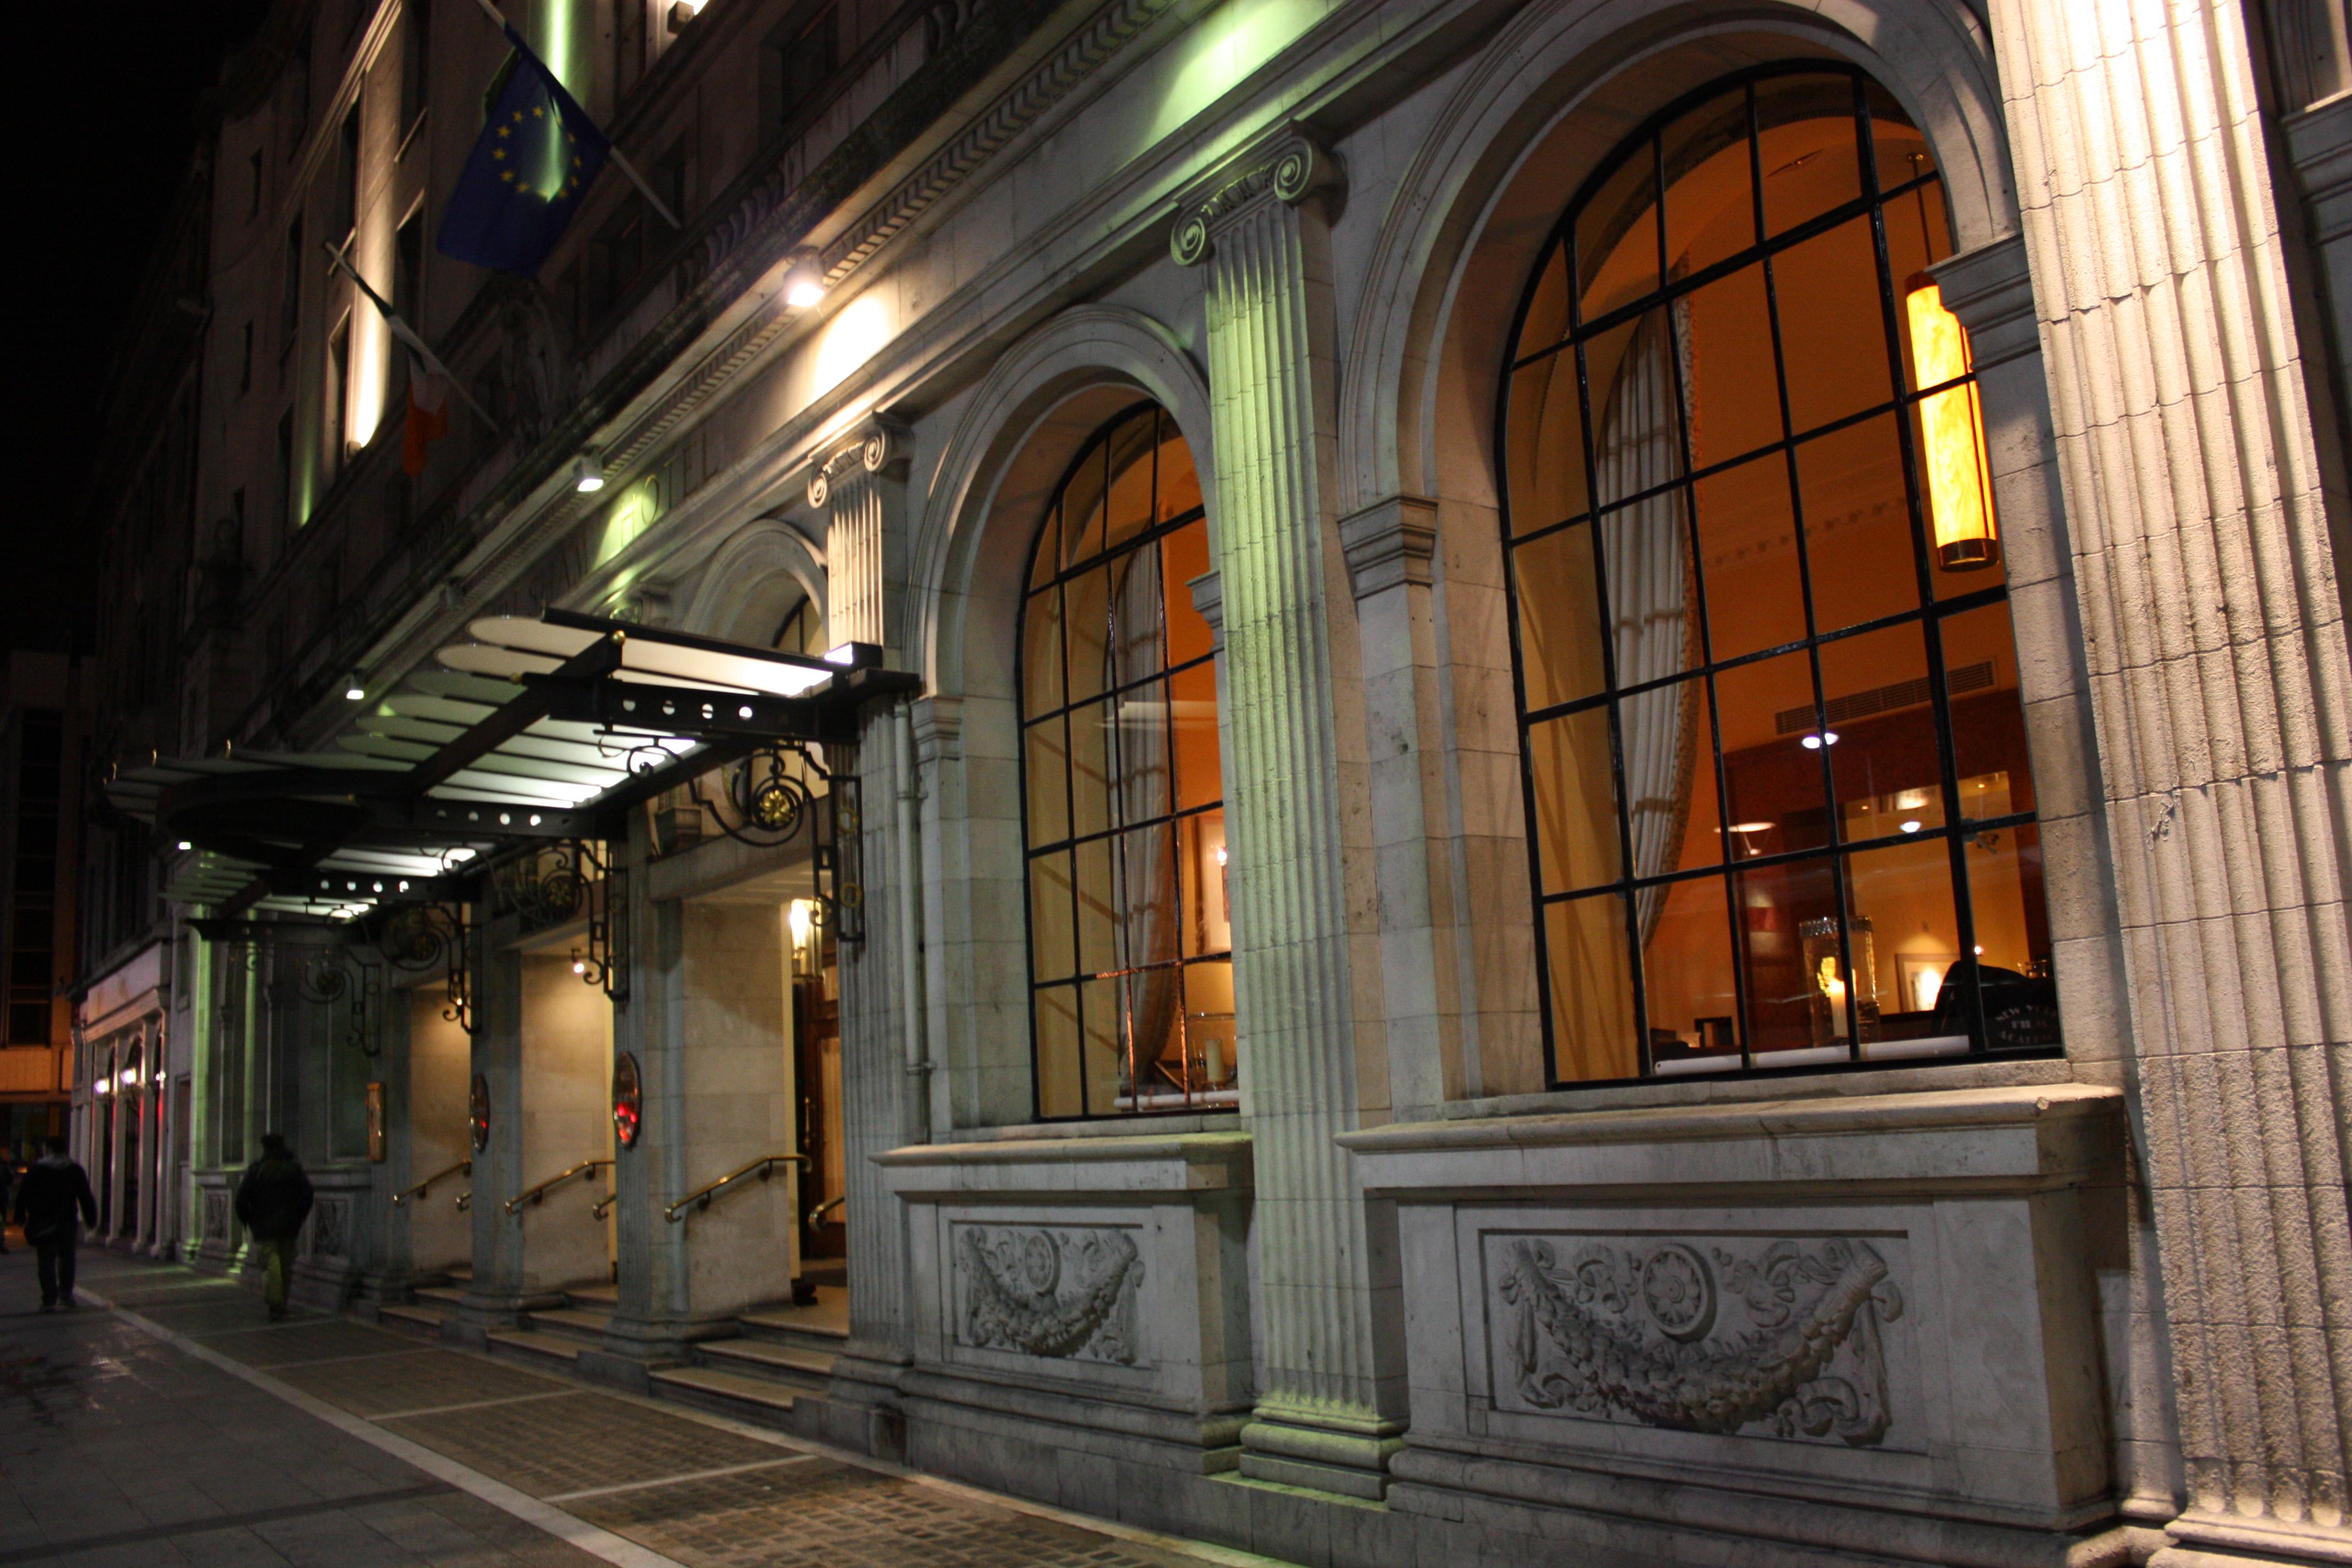 File:Gresham Hotel, Dublin, October 2010 (01).JPG